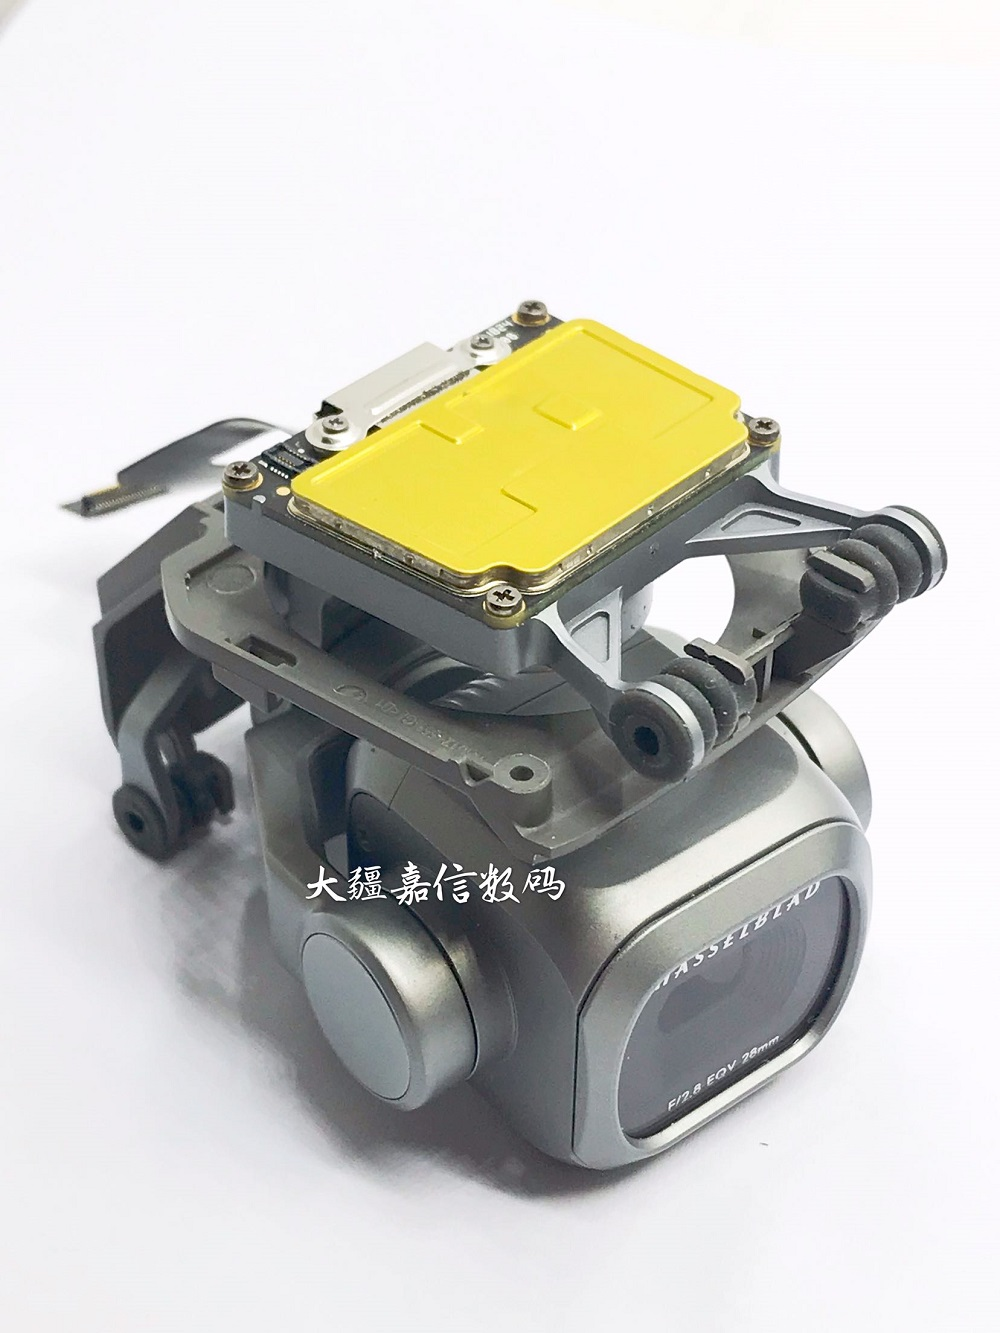 Original Mavic 2 Pro Gimbal Camera with Gimbal Board Repair Part For DJI Mavic 2 Pro Replacement Used